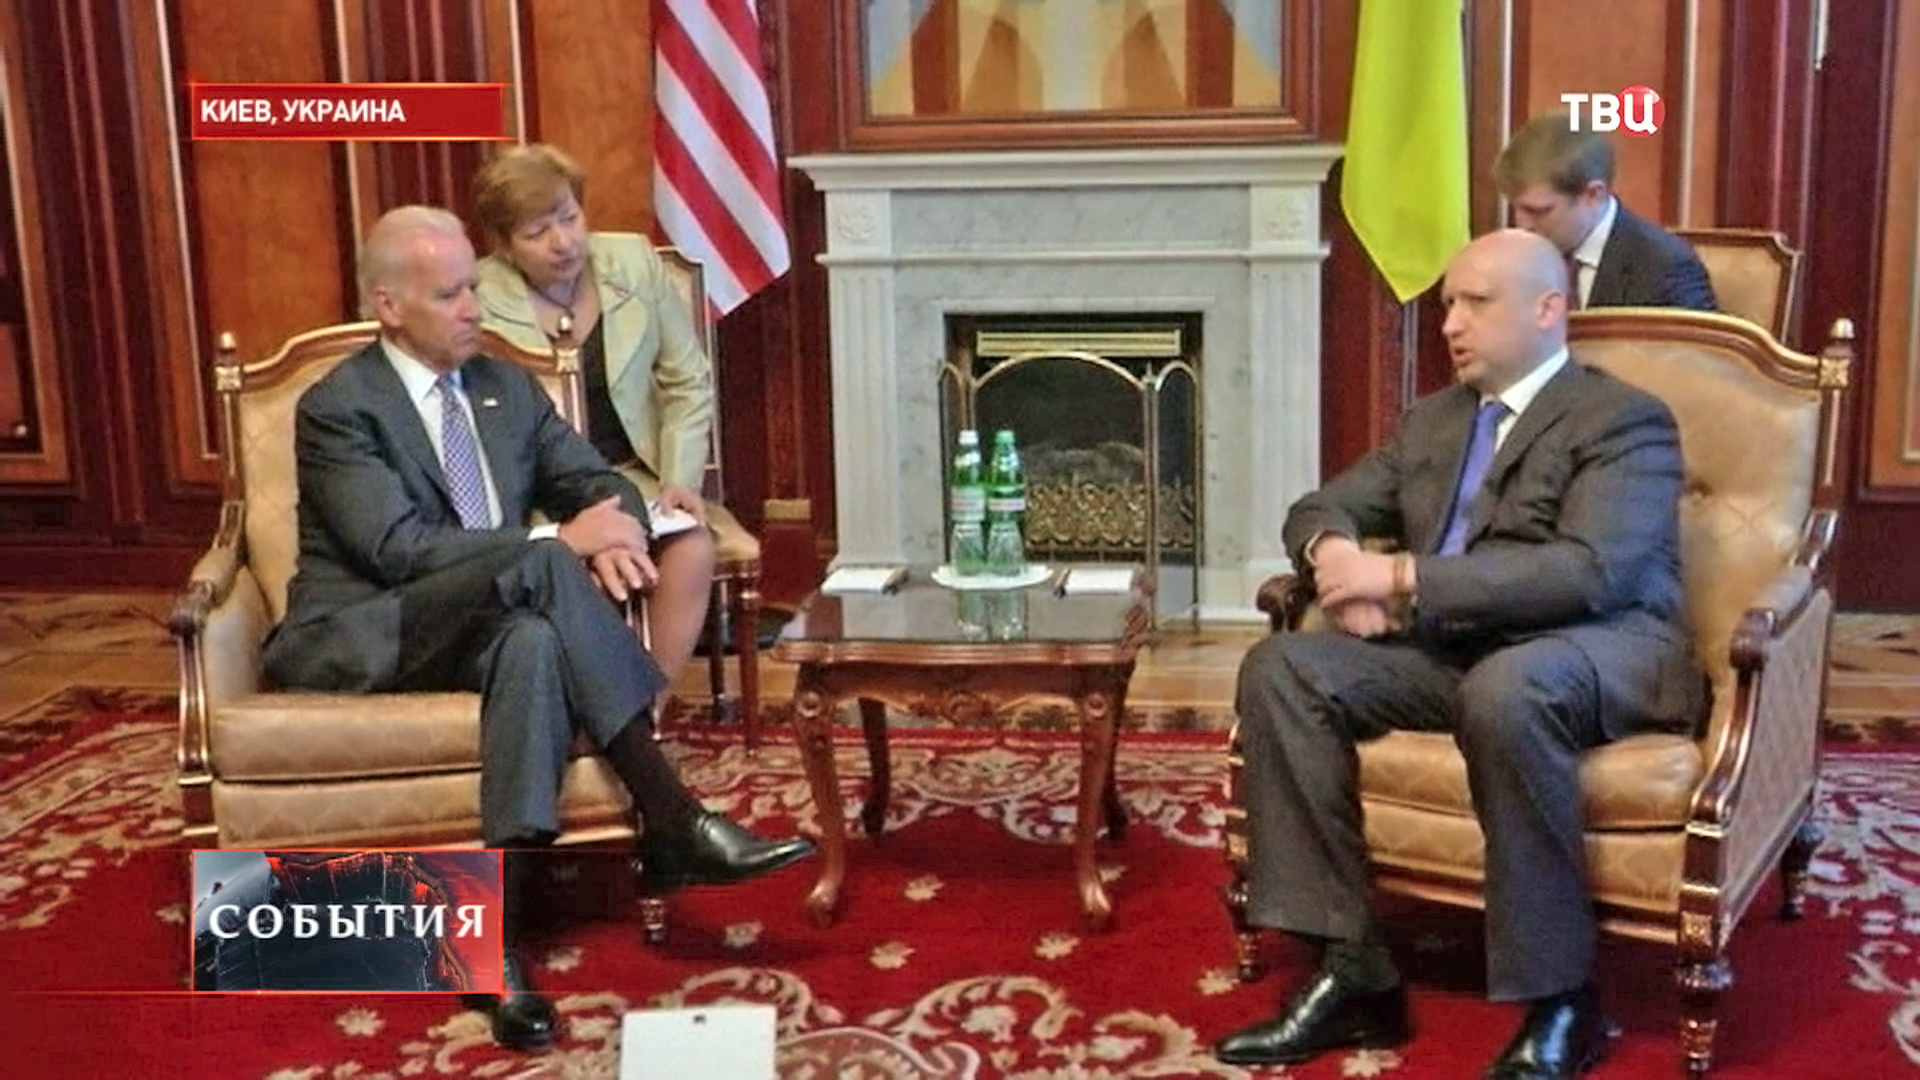 Вице-президент США Джозеф Байден и И. о. президента Украины Александр Турчинов